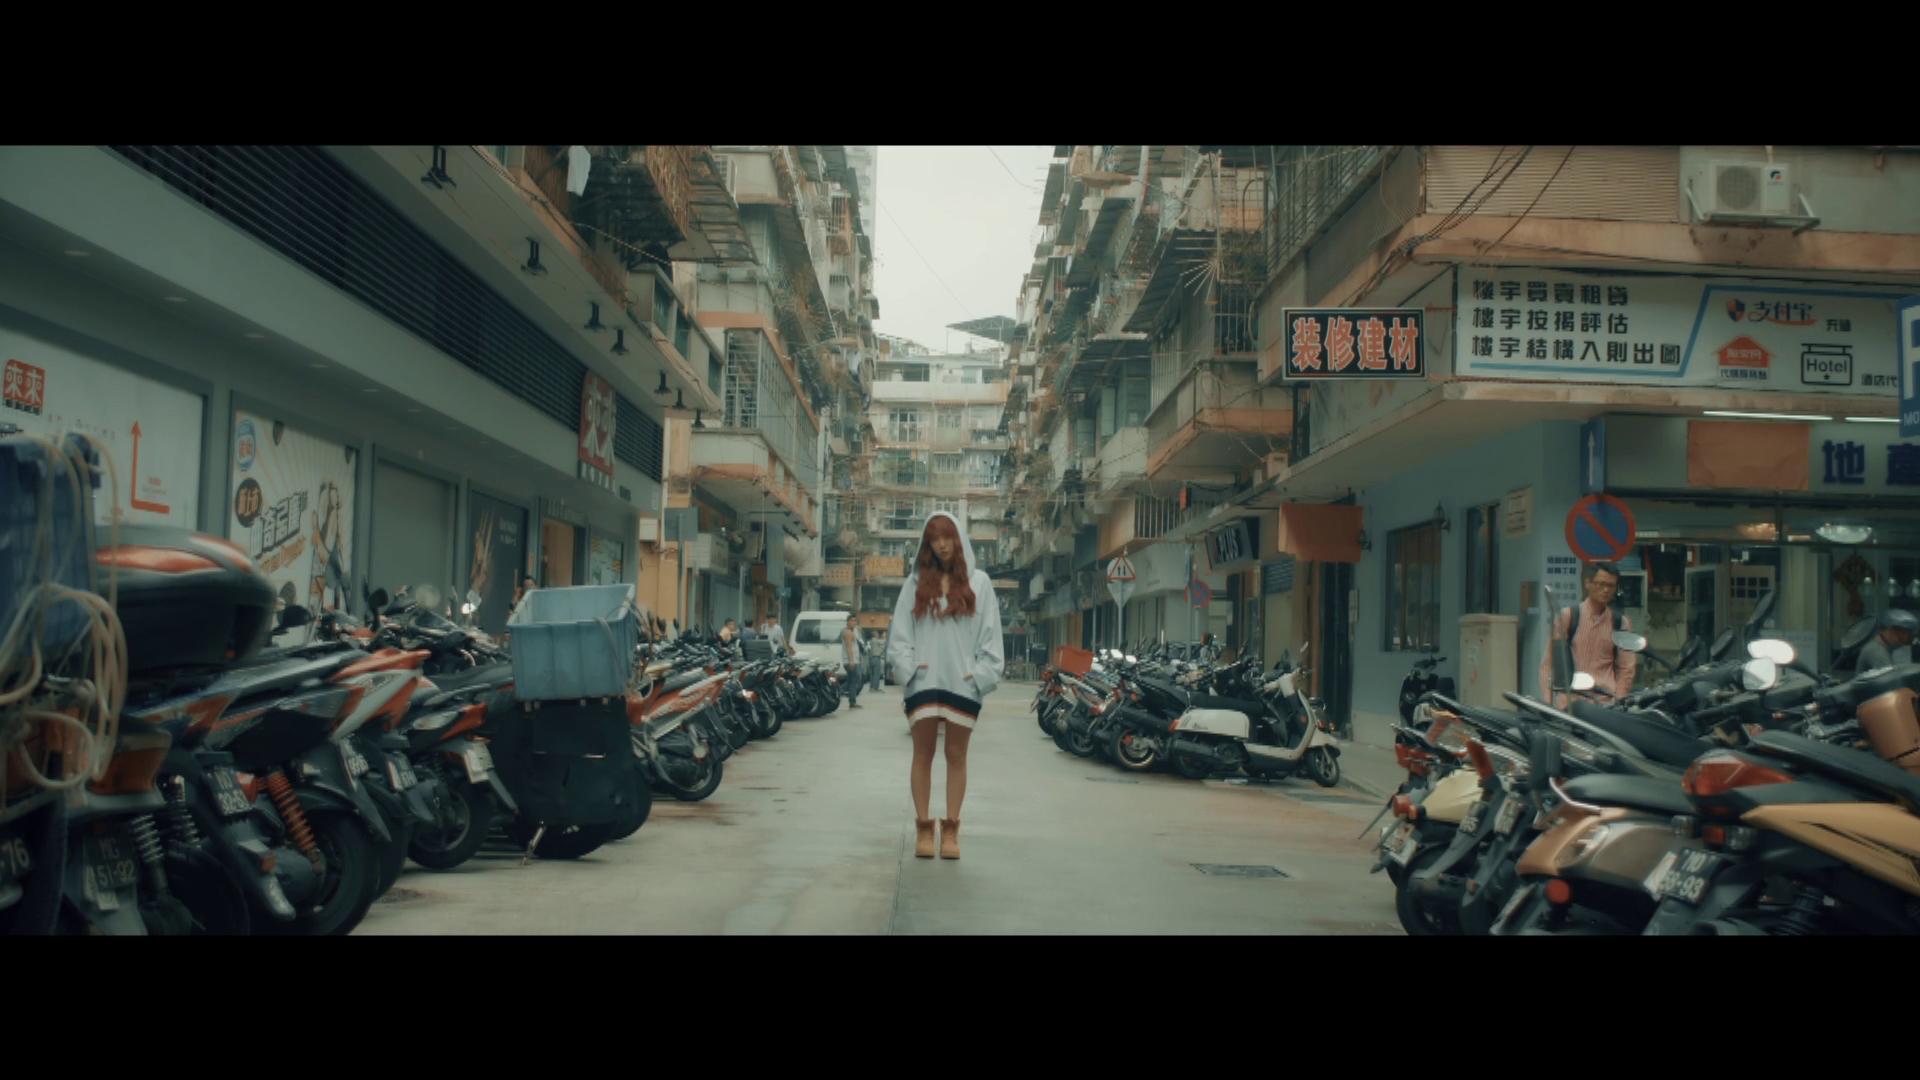 [MV] 씨스타(SISTAR) - LONELY